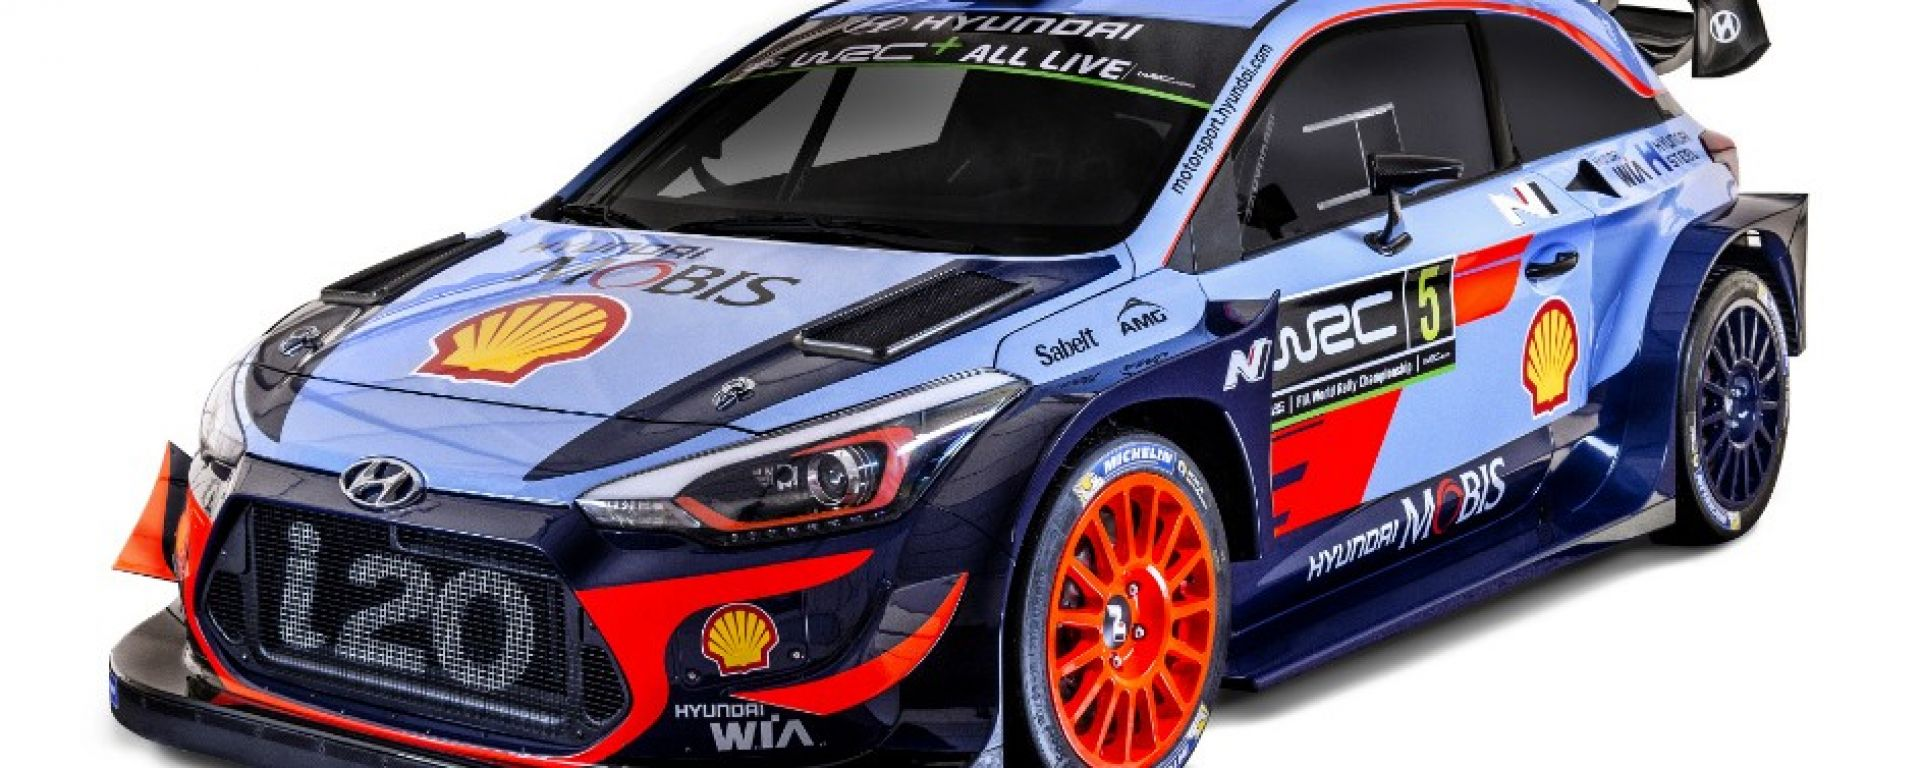 Hyundai World Rally Team WRC 2018